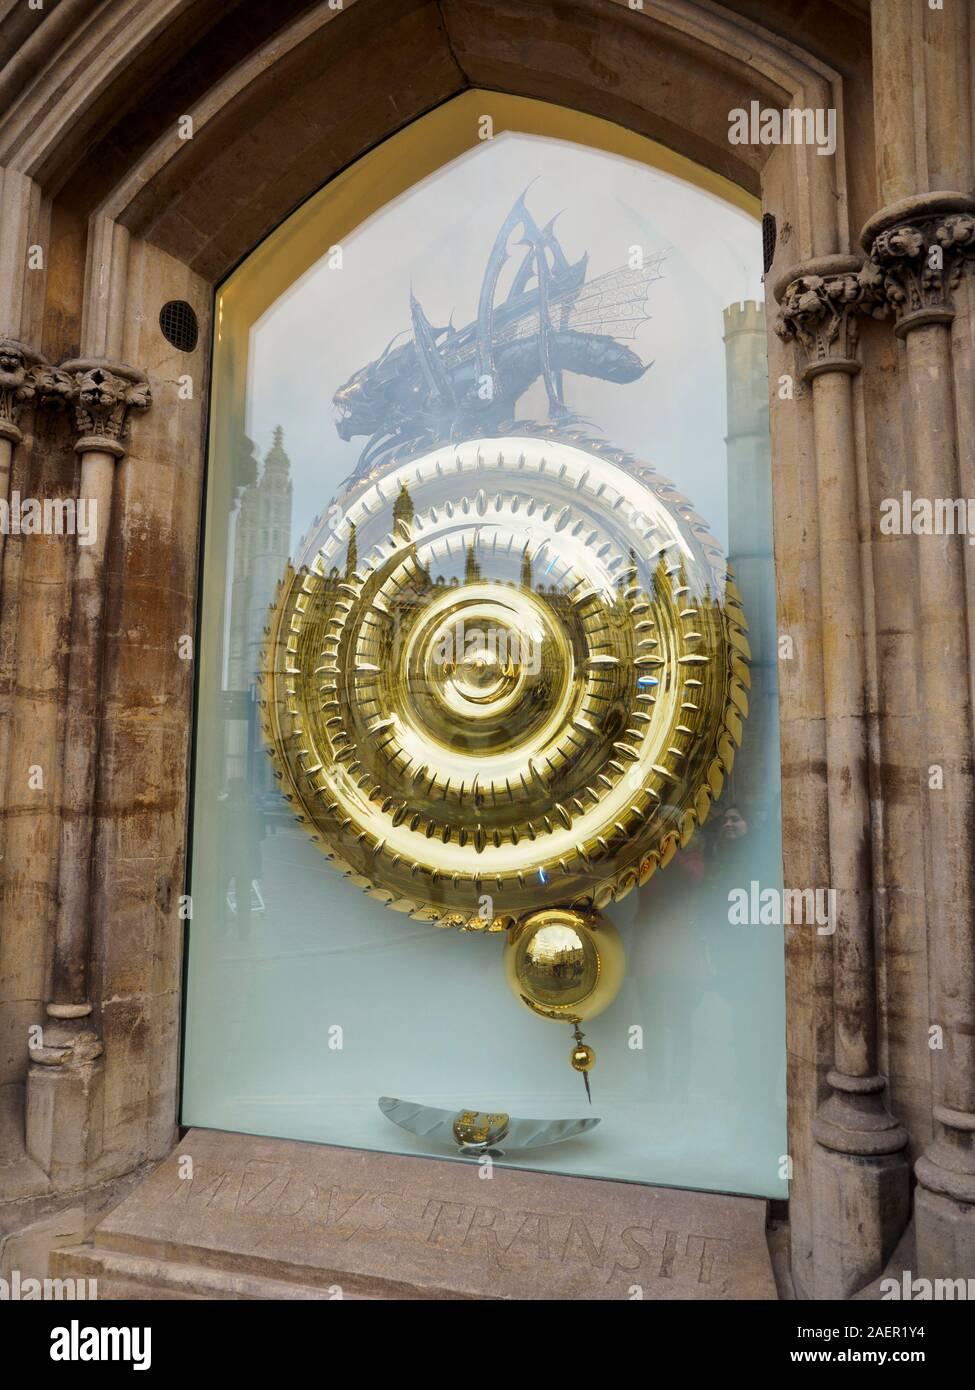 Corpus Christi Grasshopper Clock, Kings Parade, Cambridge UK Stock Photo